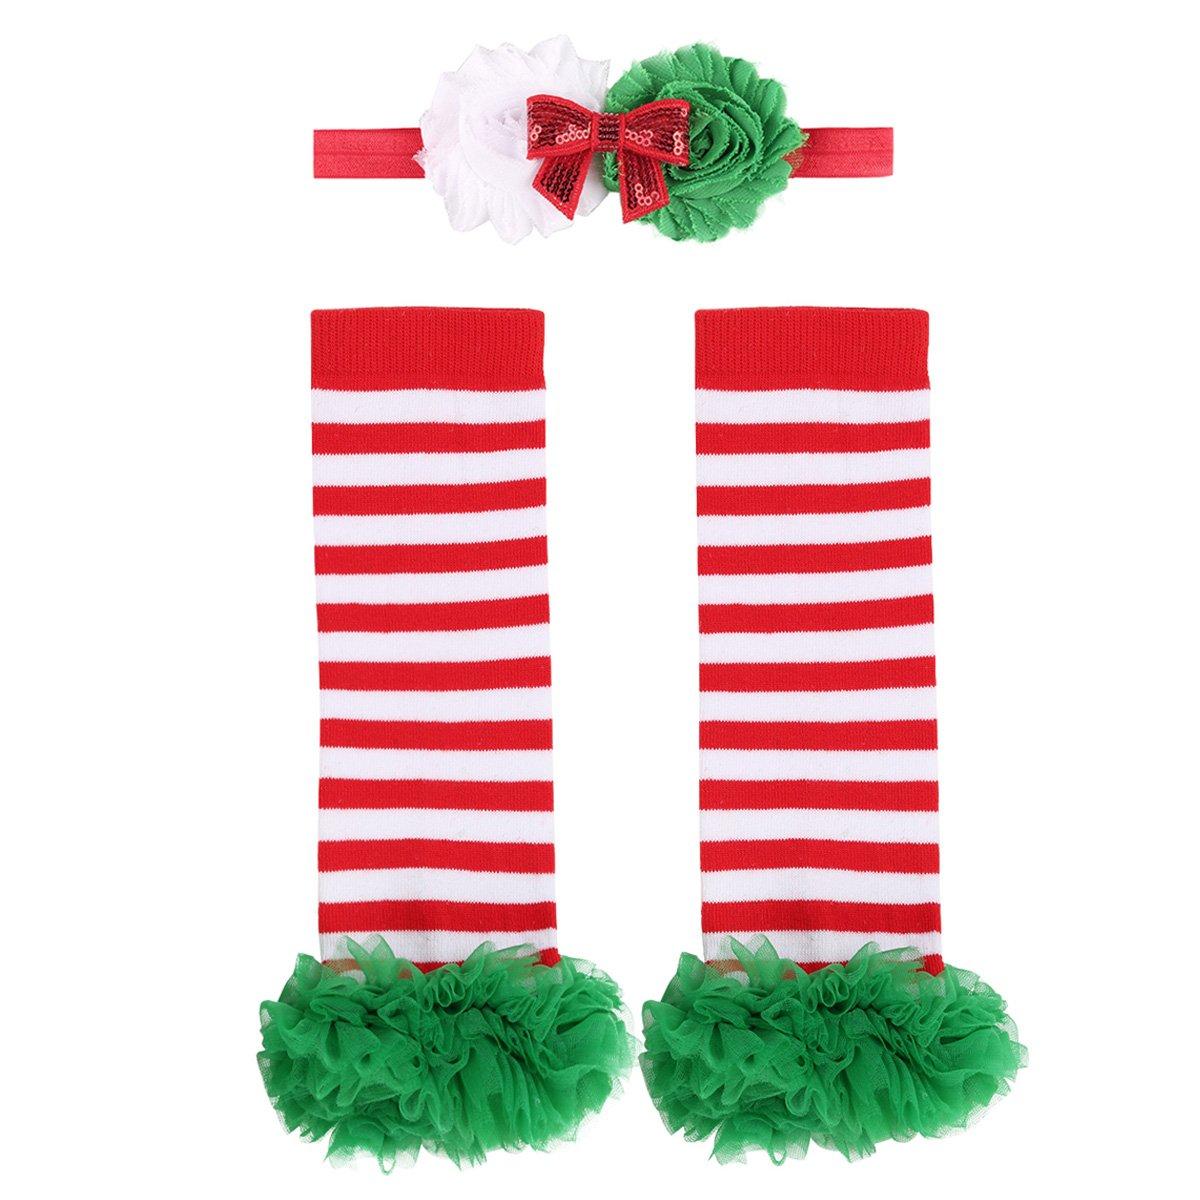 iiniim Infant Baby Girls Christmas Outfit Headbands with Leg Warmers Leggings Tights